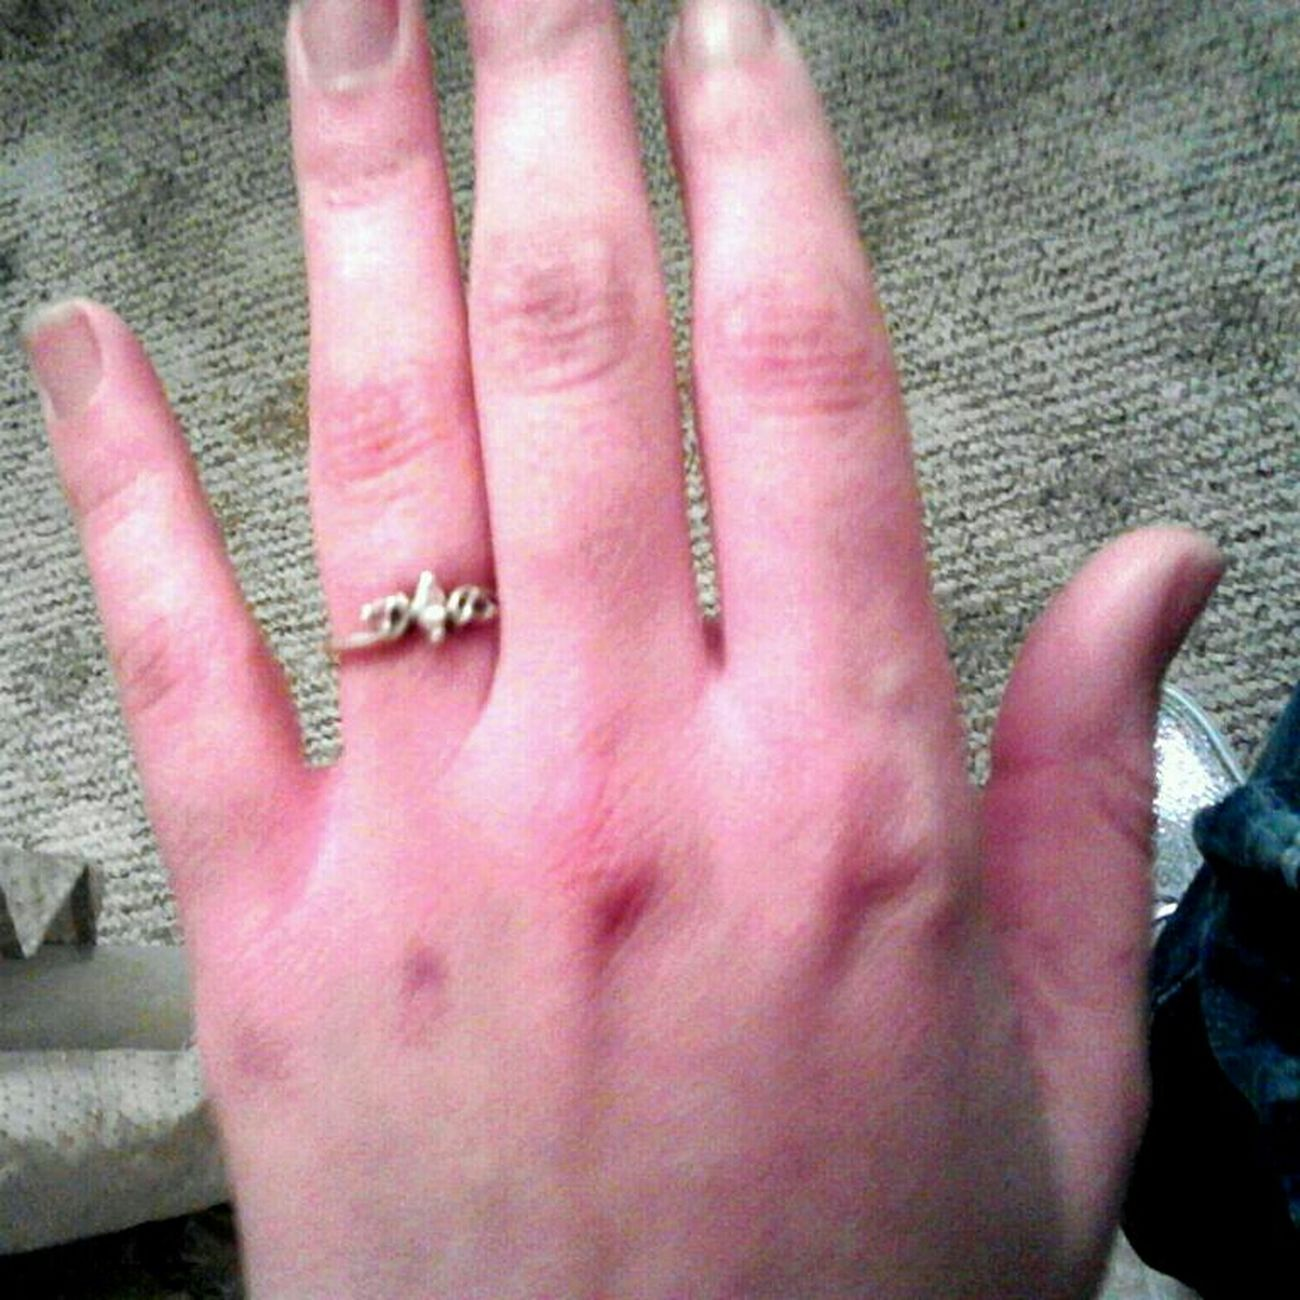 This cold got my hands lookin weird nn red af !!